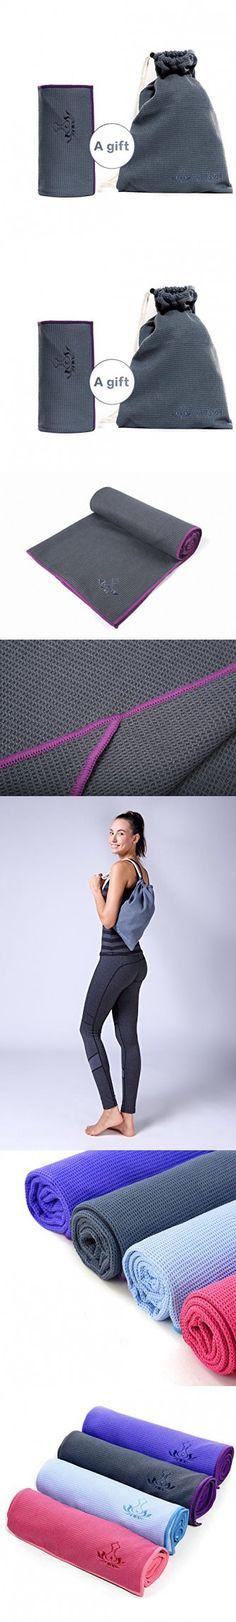 Non Slip Yoga Towel (Free Towel Bag) by Heathyoga, Silicone Anti Skid Layer, With 4 Corner Ears, Optimal grip, Super Absorbent, Microfiber, Perfect for Hot Yoga, Bikram Yoga and Ashtanga Yoga. ...